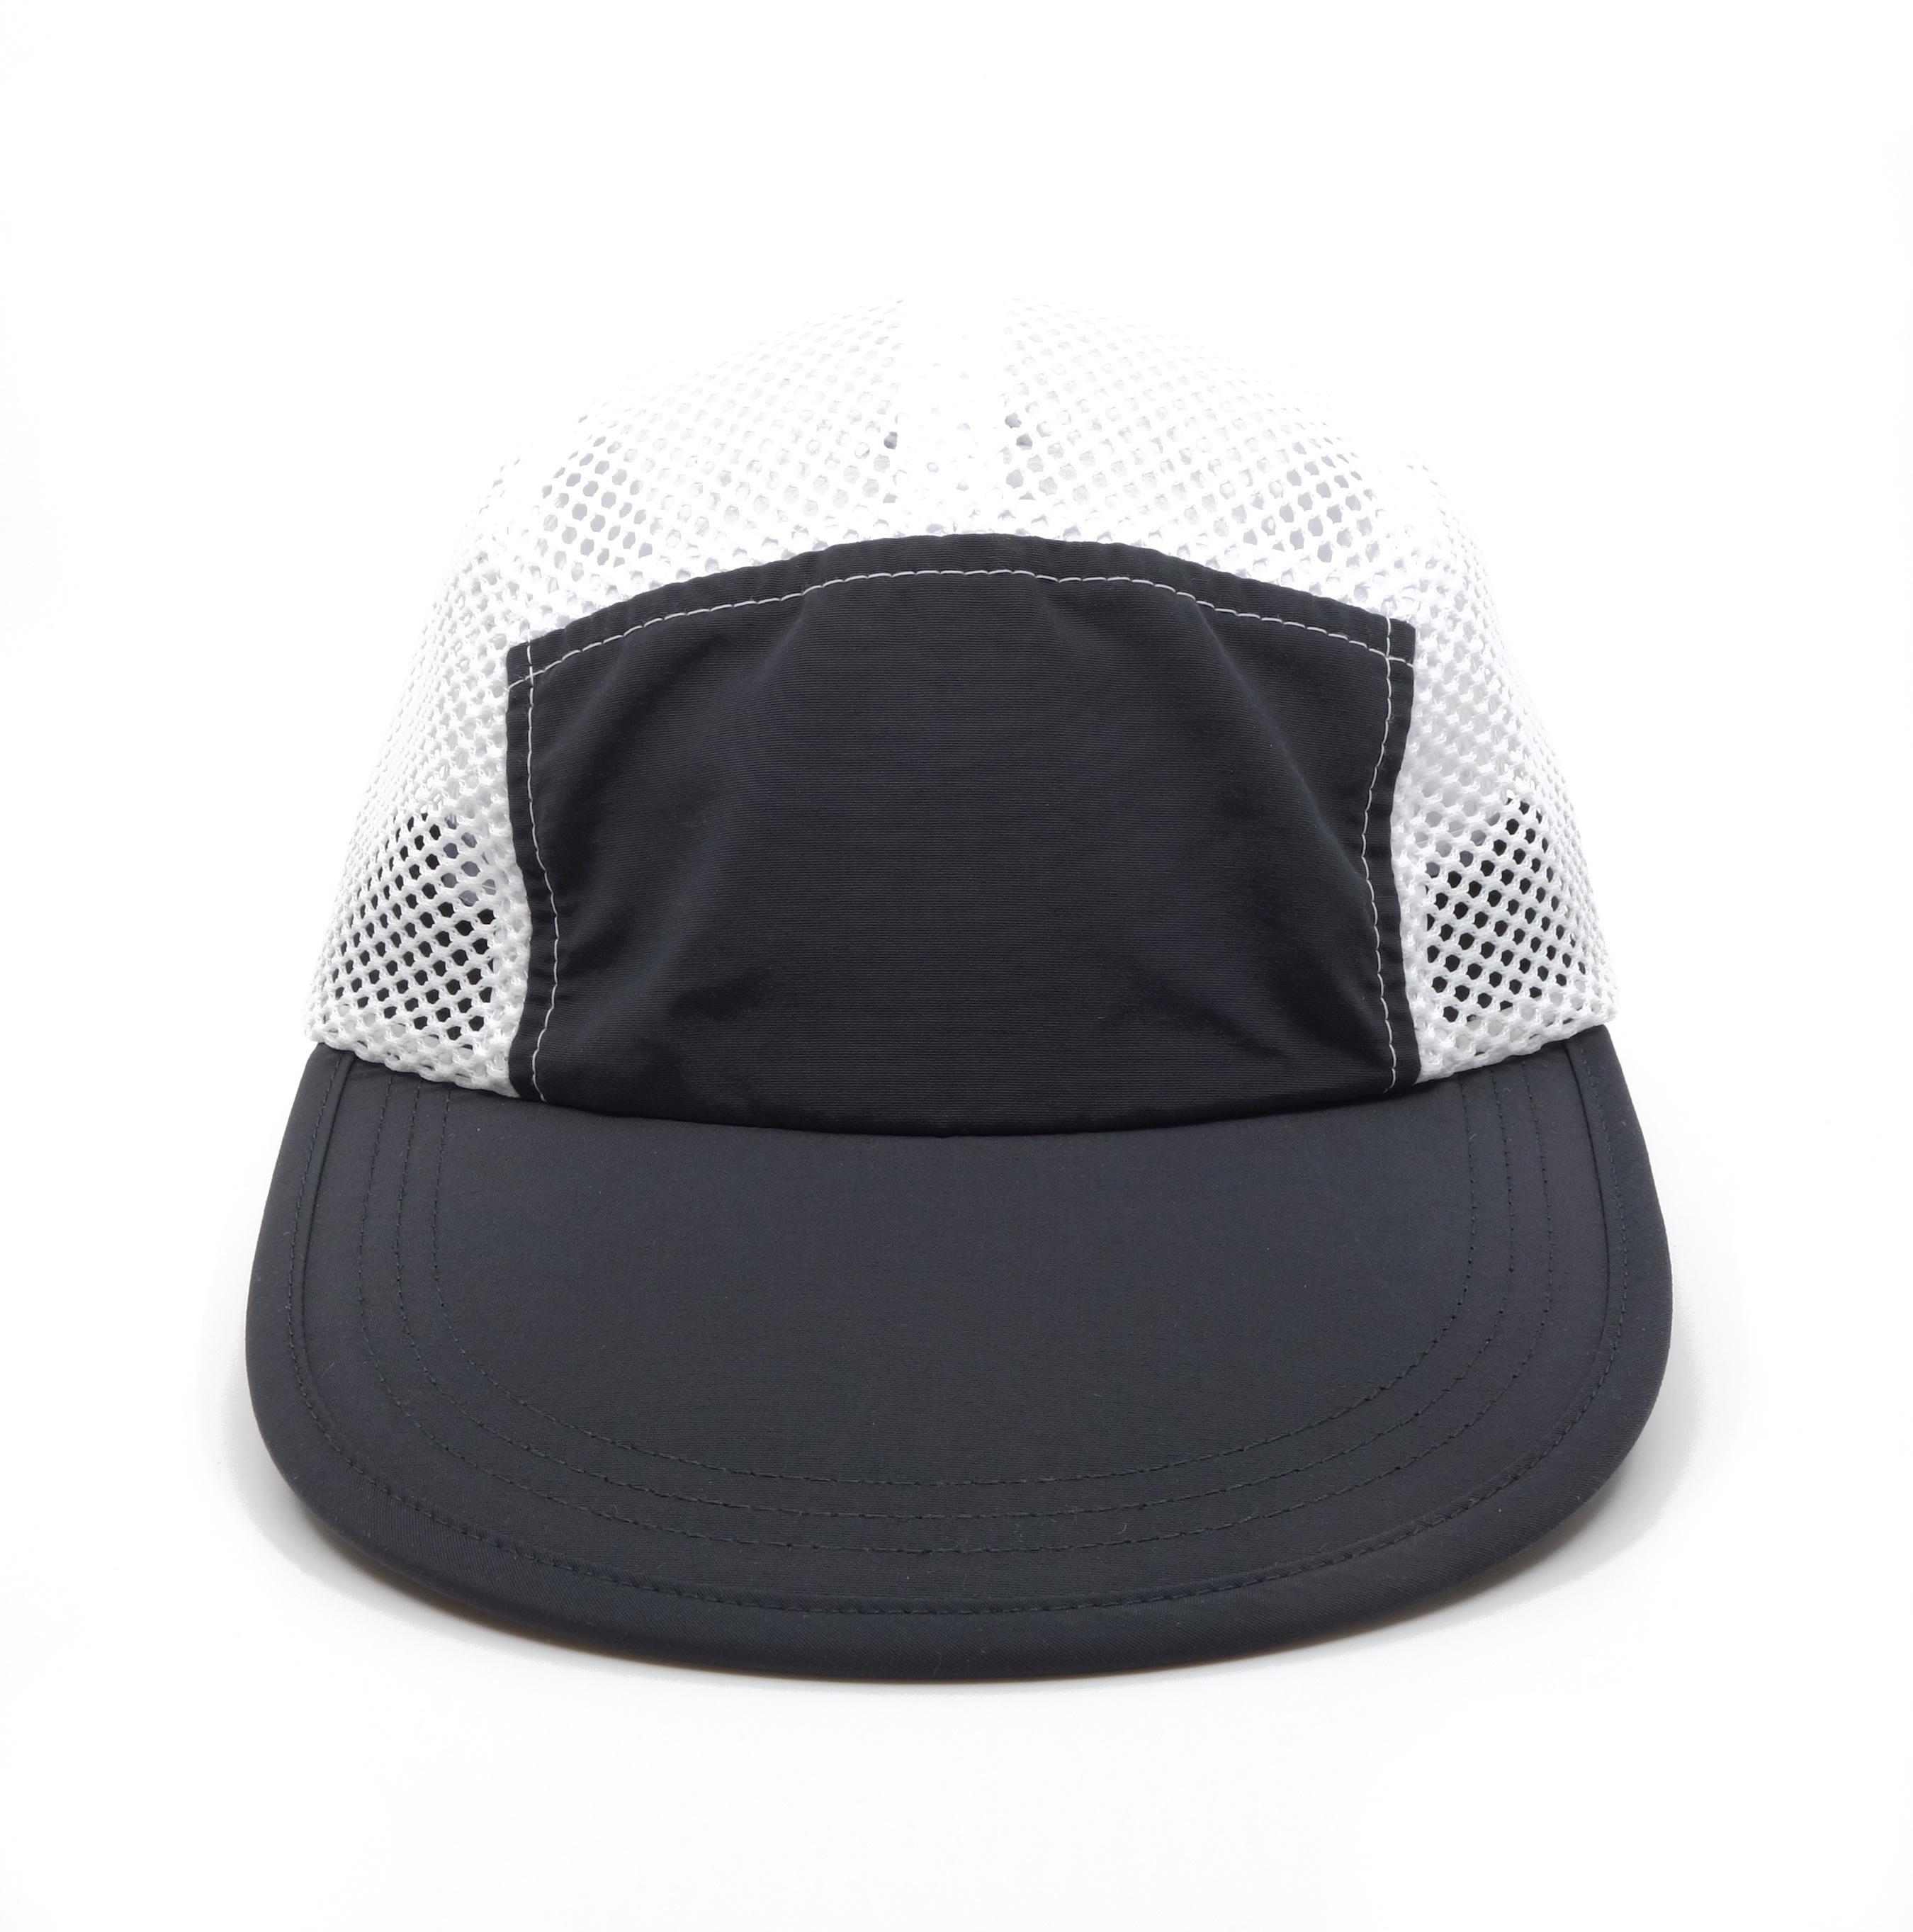 VELOSPICA / PIG SNOUT CAMP CAPS